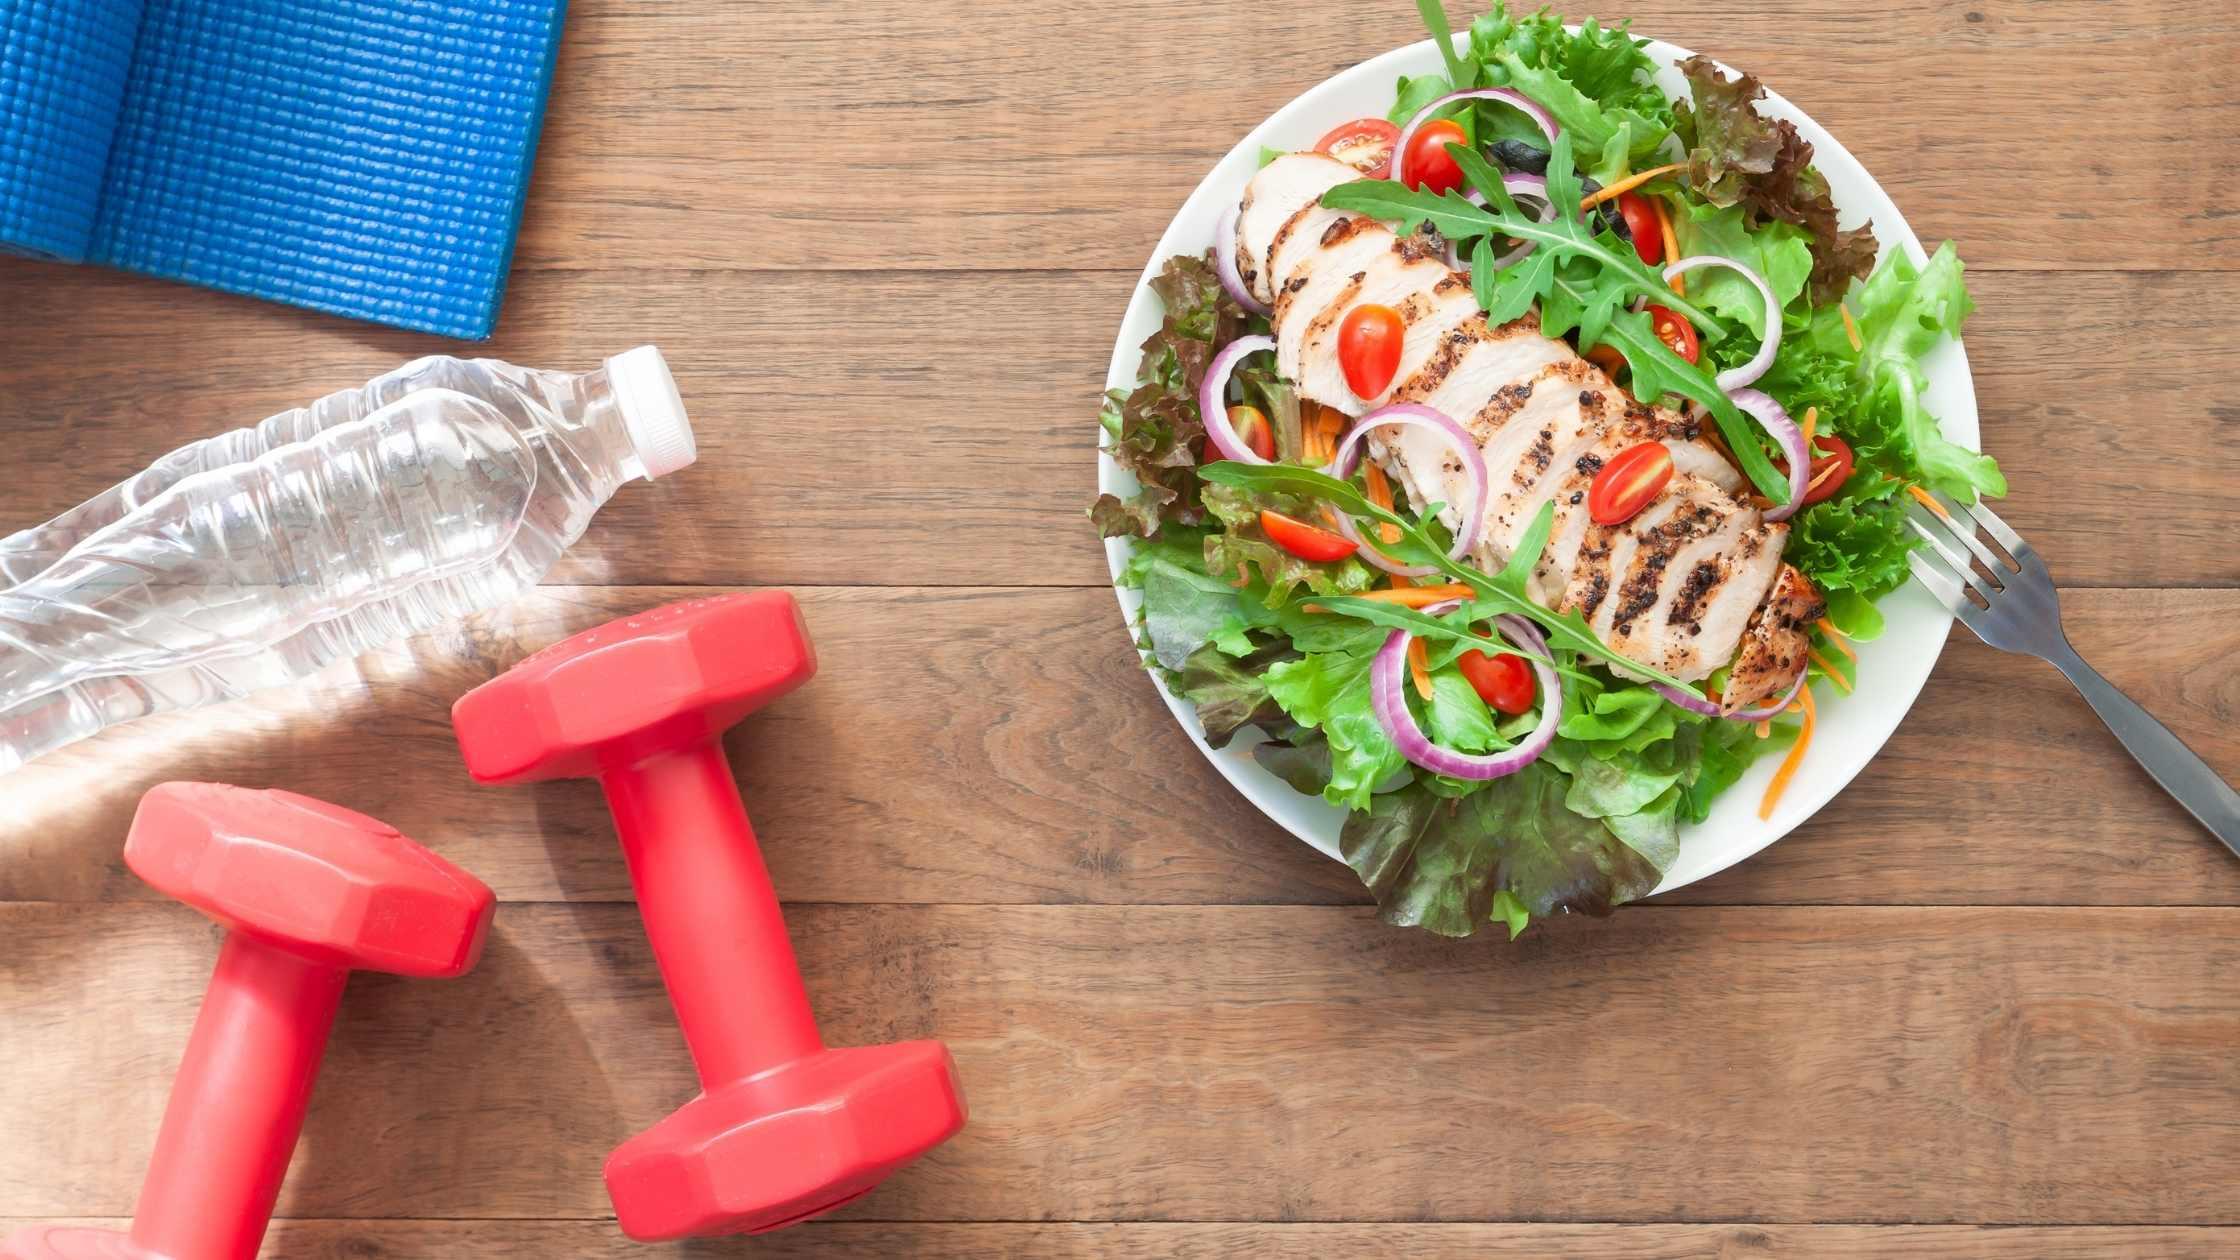 building healthy habits weights salad water